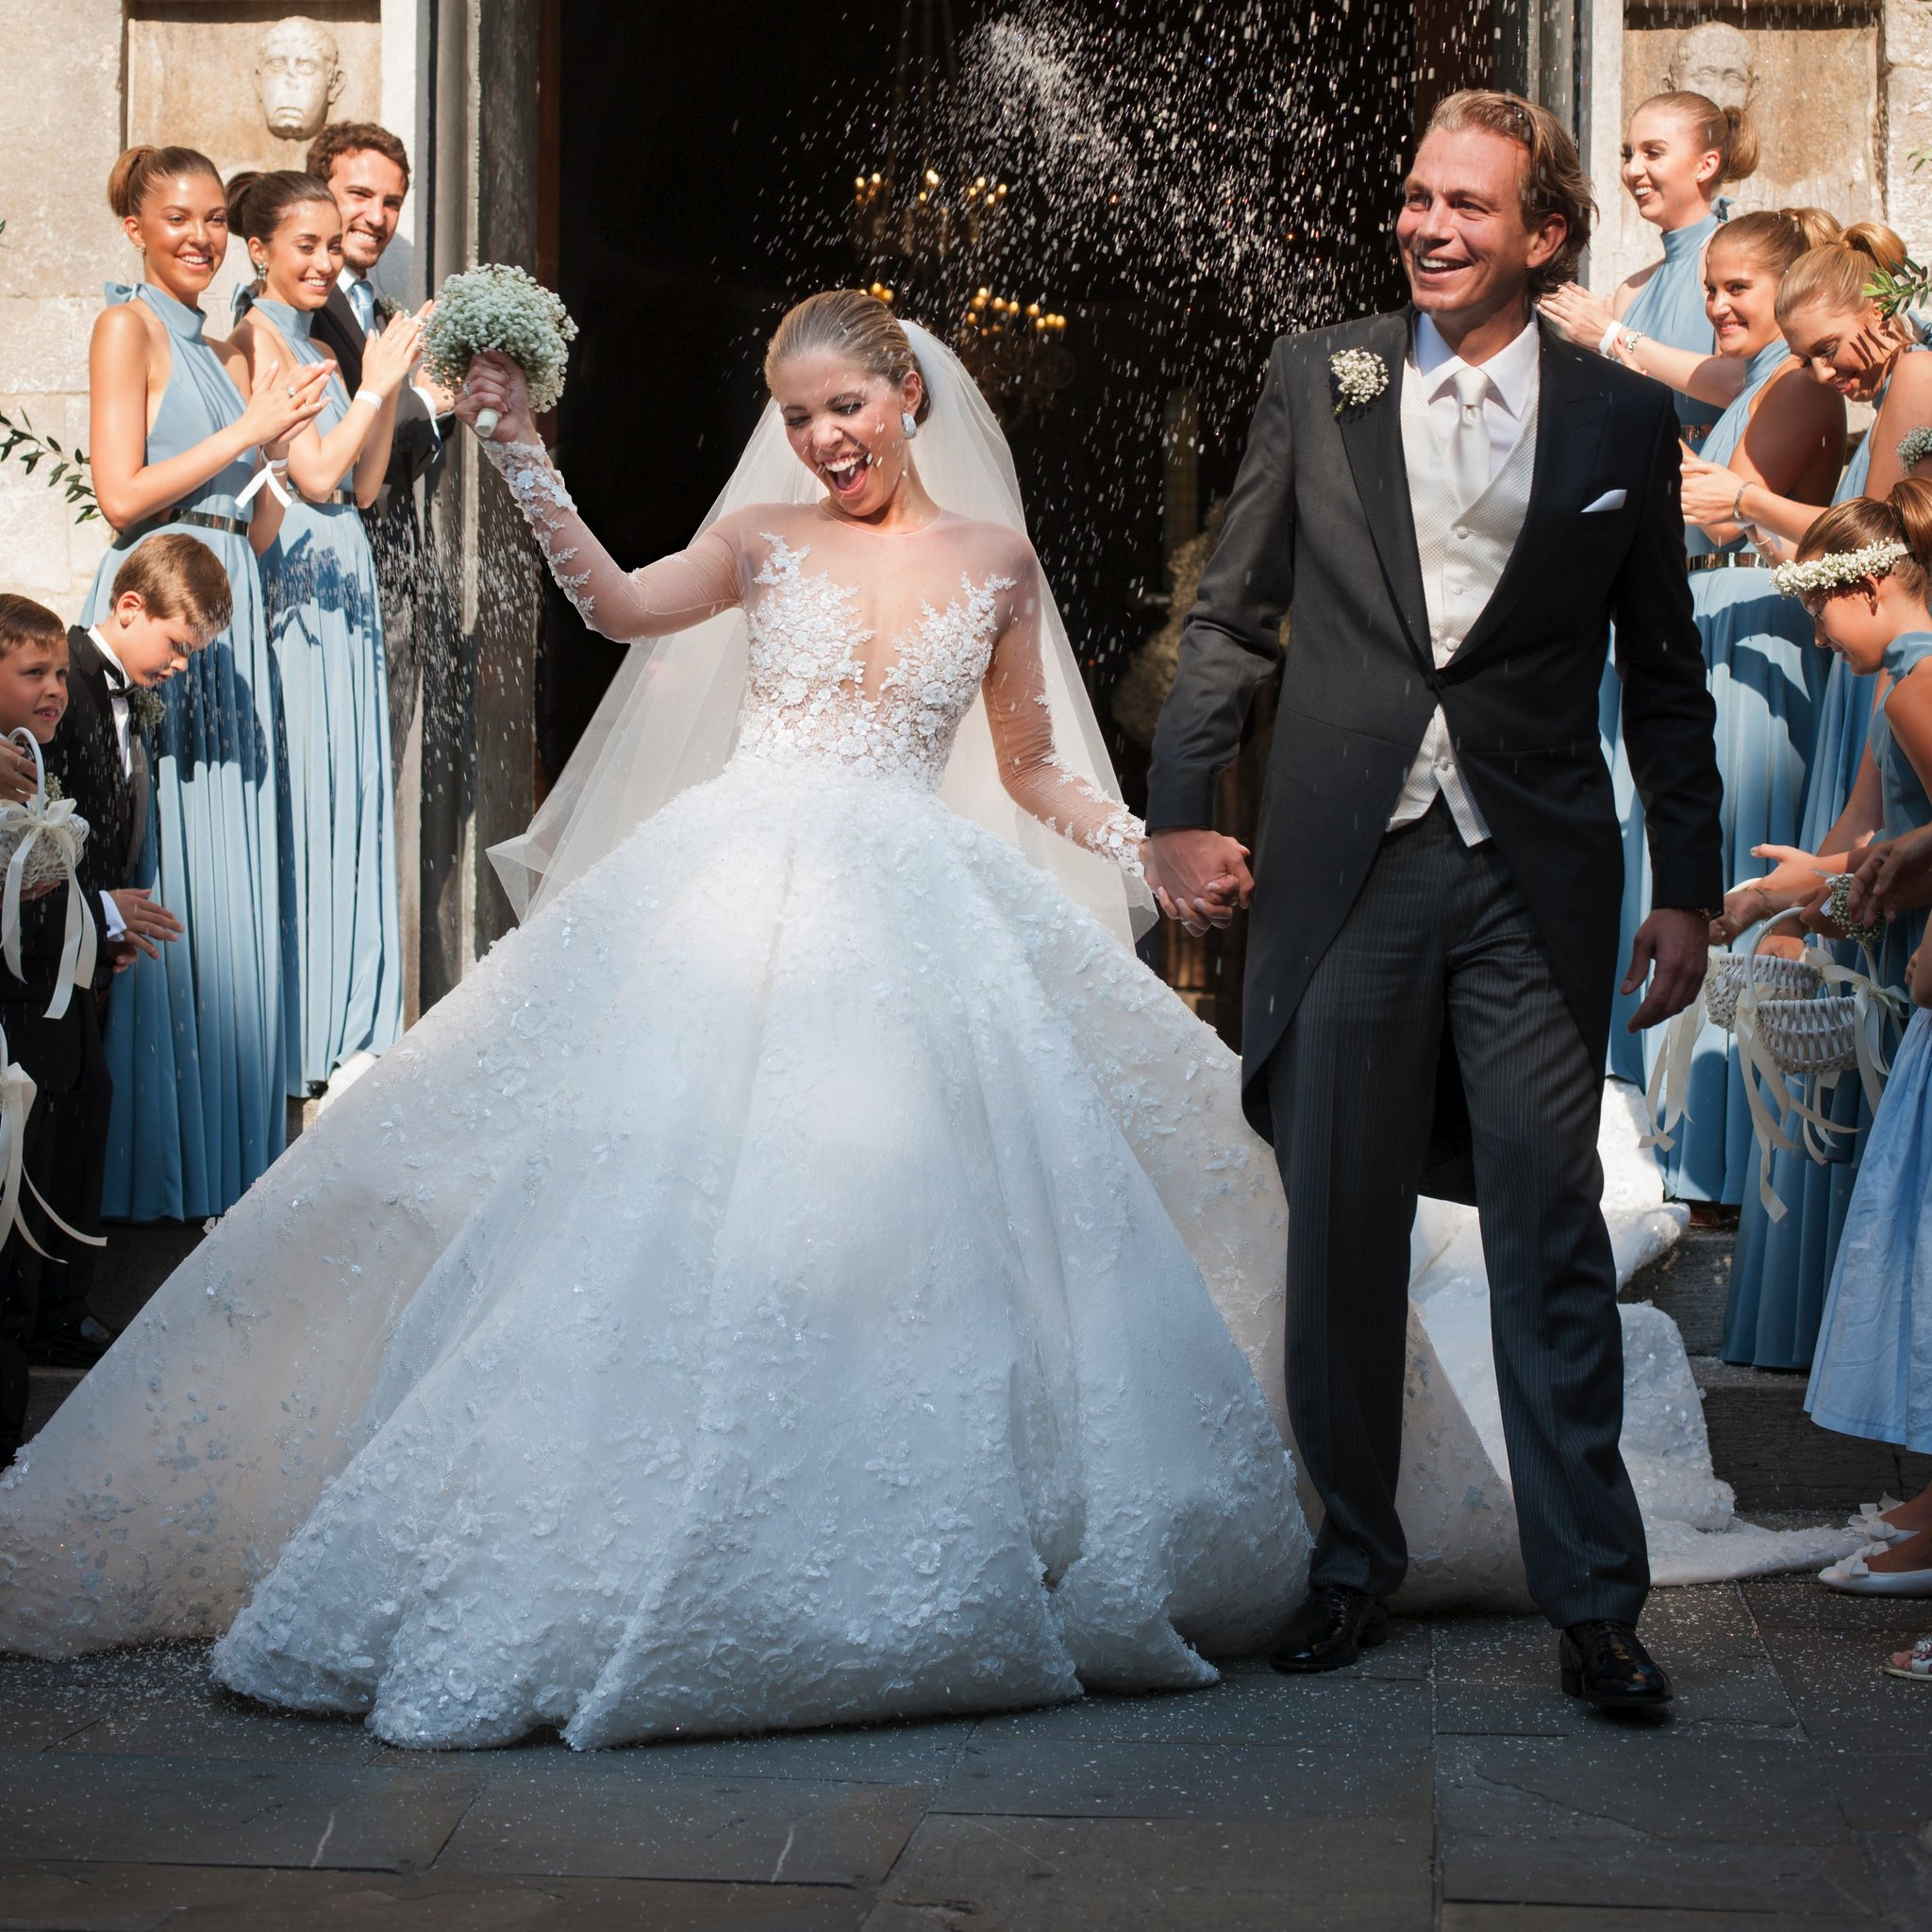 over the top weddingsVictoria-Swarovski-Michael-Cinco-Wedding-Dress.jpg